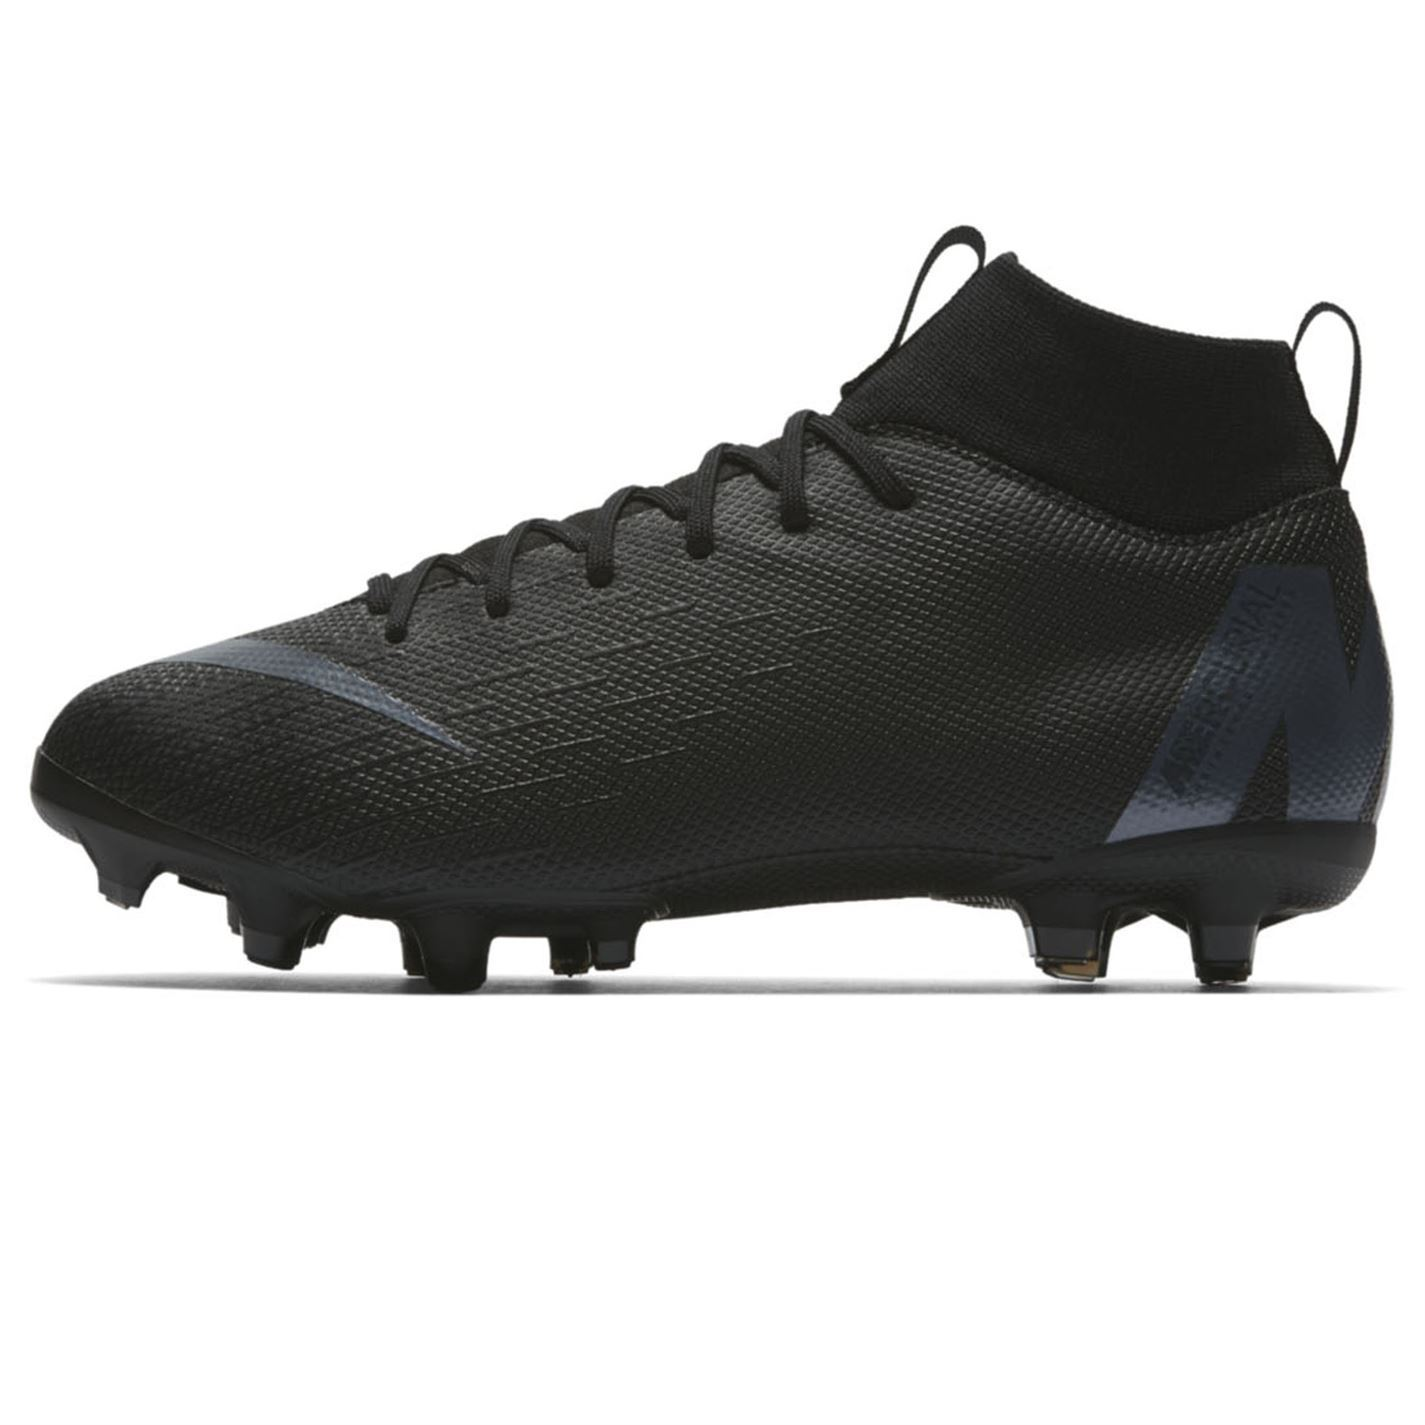 miniature 3 - Nike-Mercurial-Superfly-Academy-Terre-Ferme-Chaussures-De-Football-Juniors-Football-Crampons